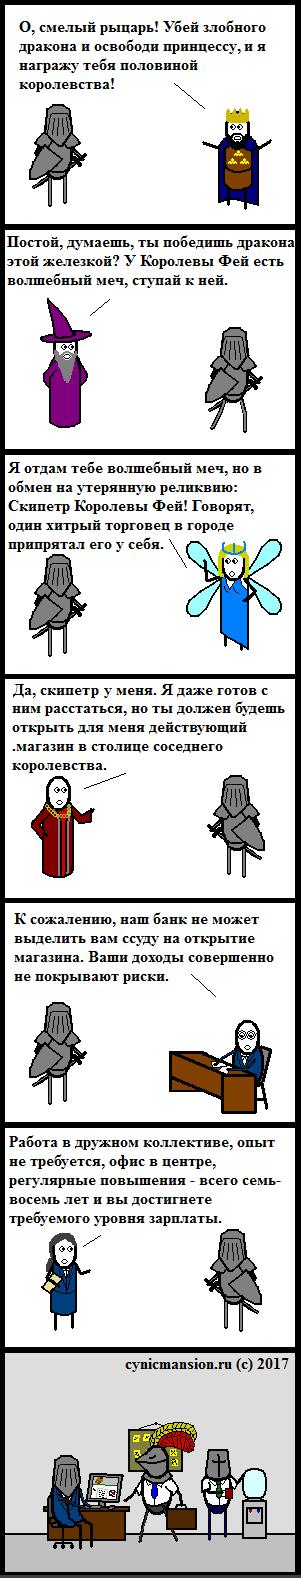 Рыцарское cynicmansion, Комиксы, Рыцарь, дракон, сказка, длиннопост